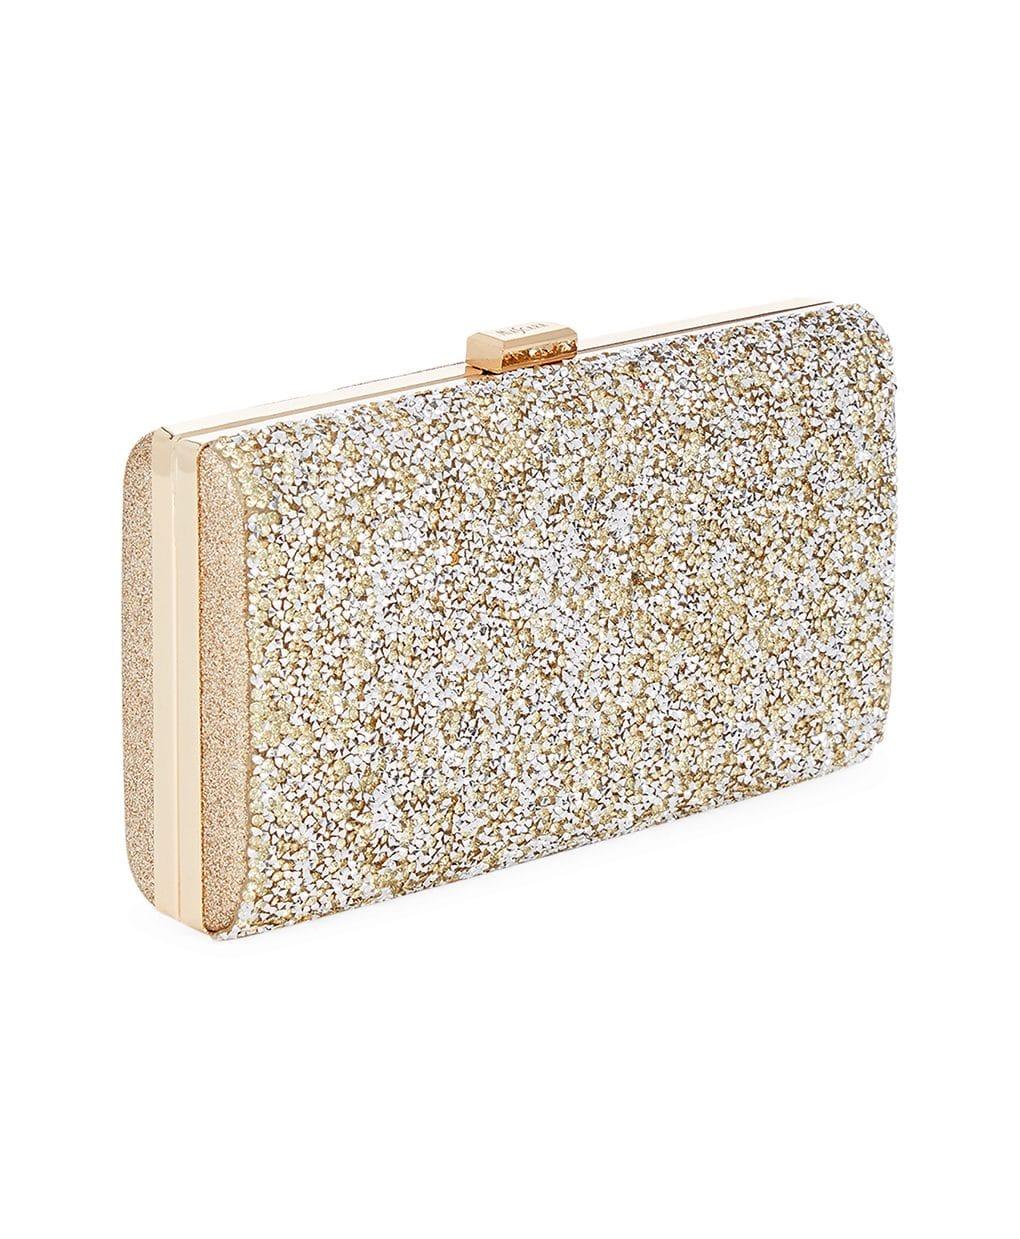 77bc5de548e6c Mascara Gold Embellished Box Clutch Bag | Alila Boutique